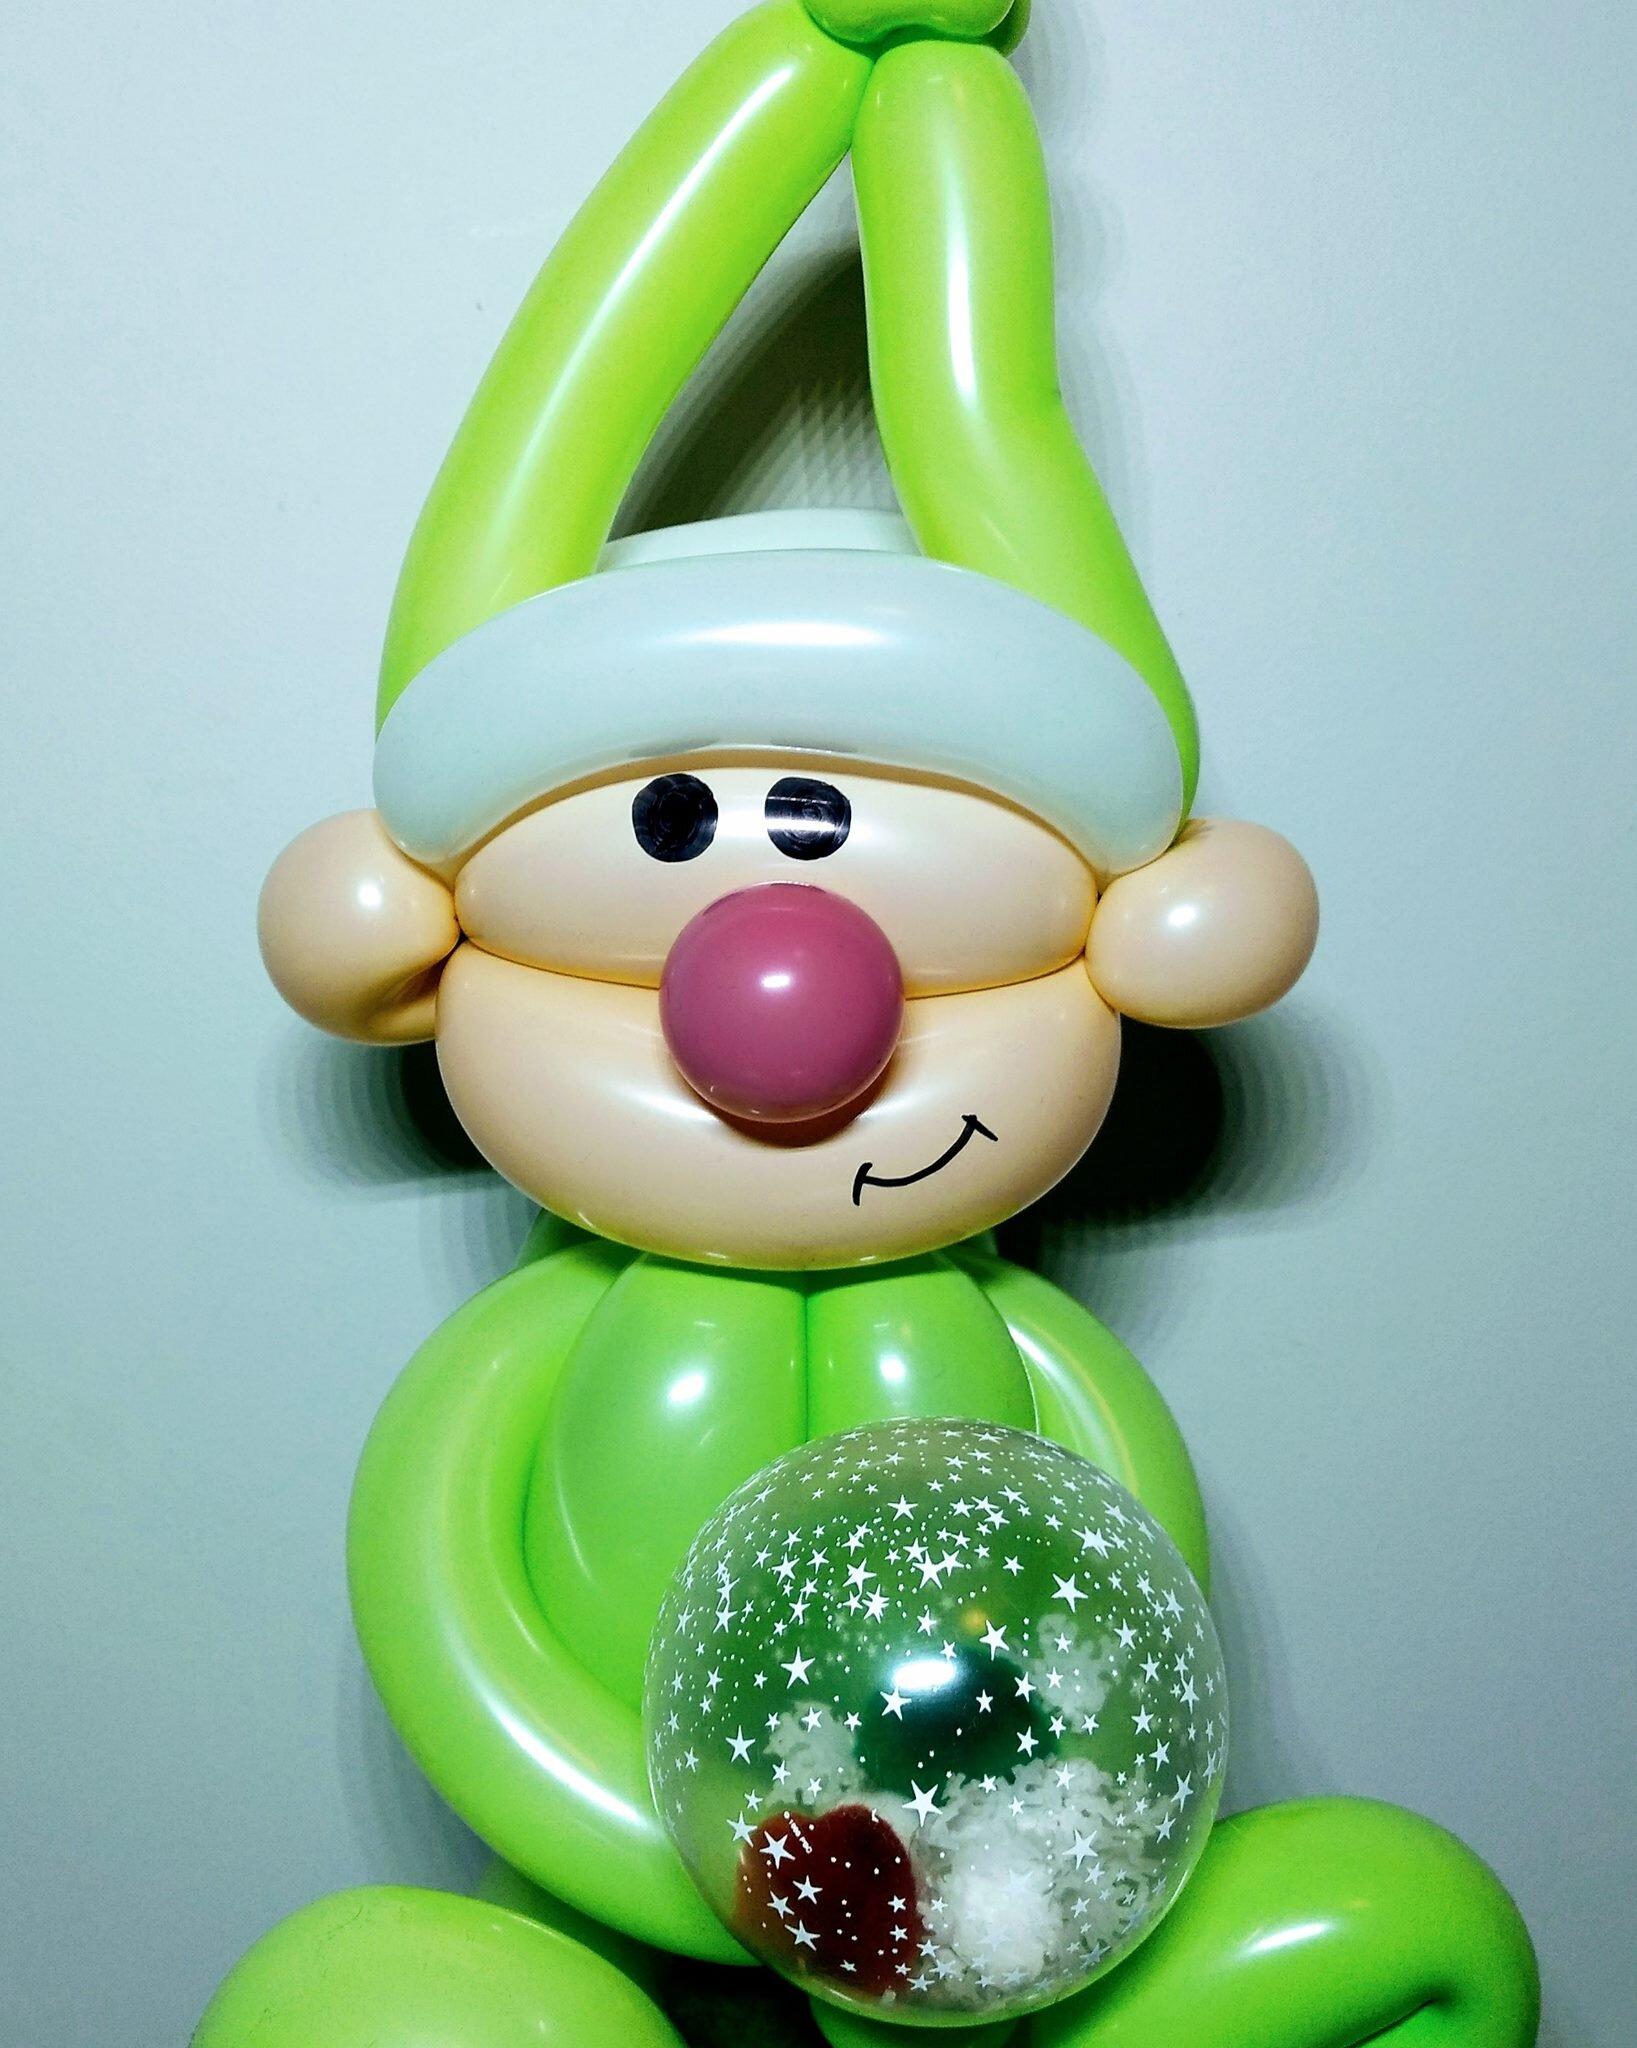 Ballon Modeller for Hire